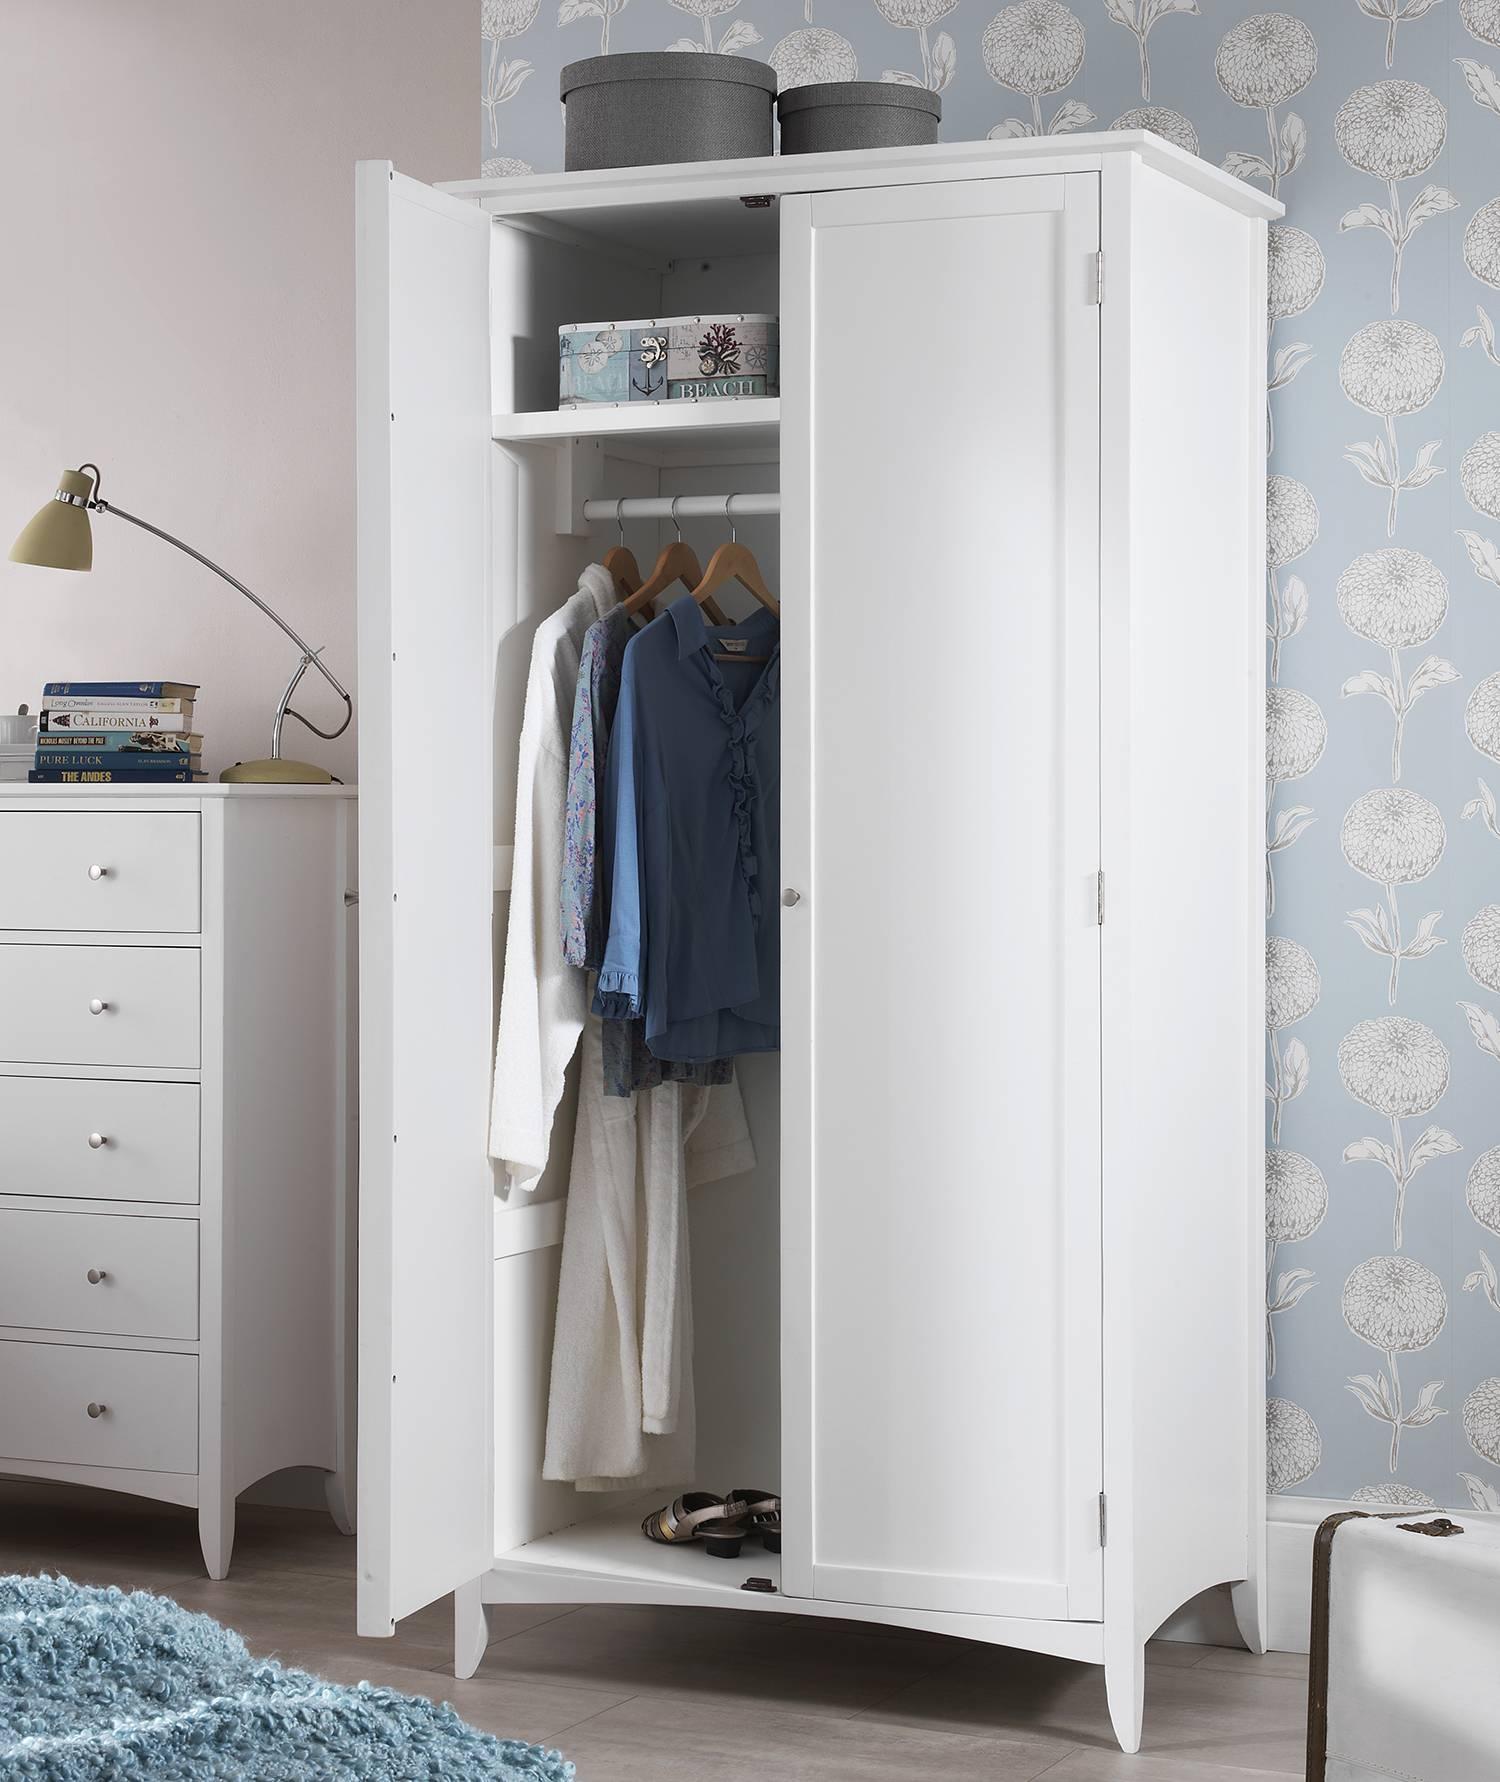 Edward Hopper White Double Wardrobe, Quality Large Wardrobe, Shelf Pertaining To Double Rail Wardrobes (View 29 of 30)